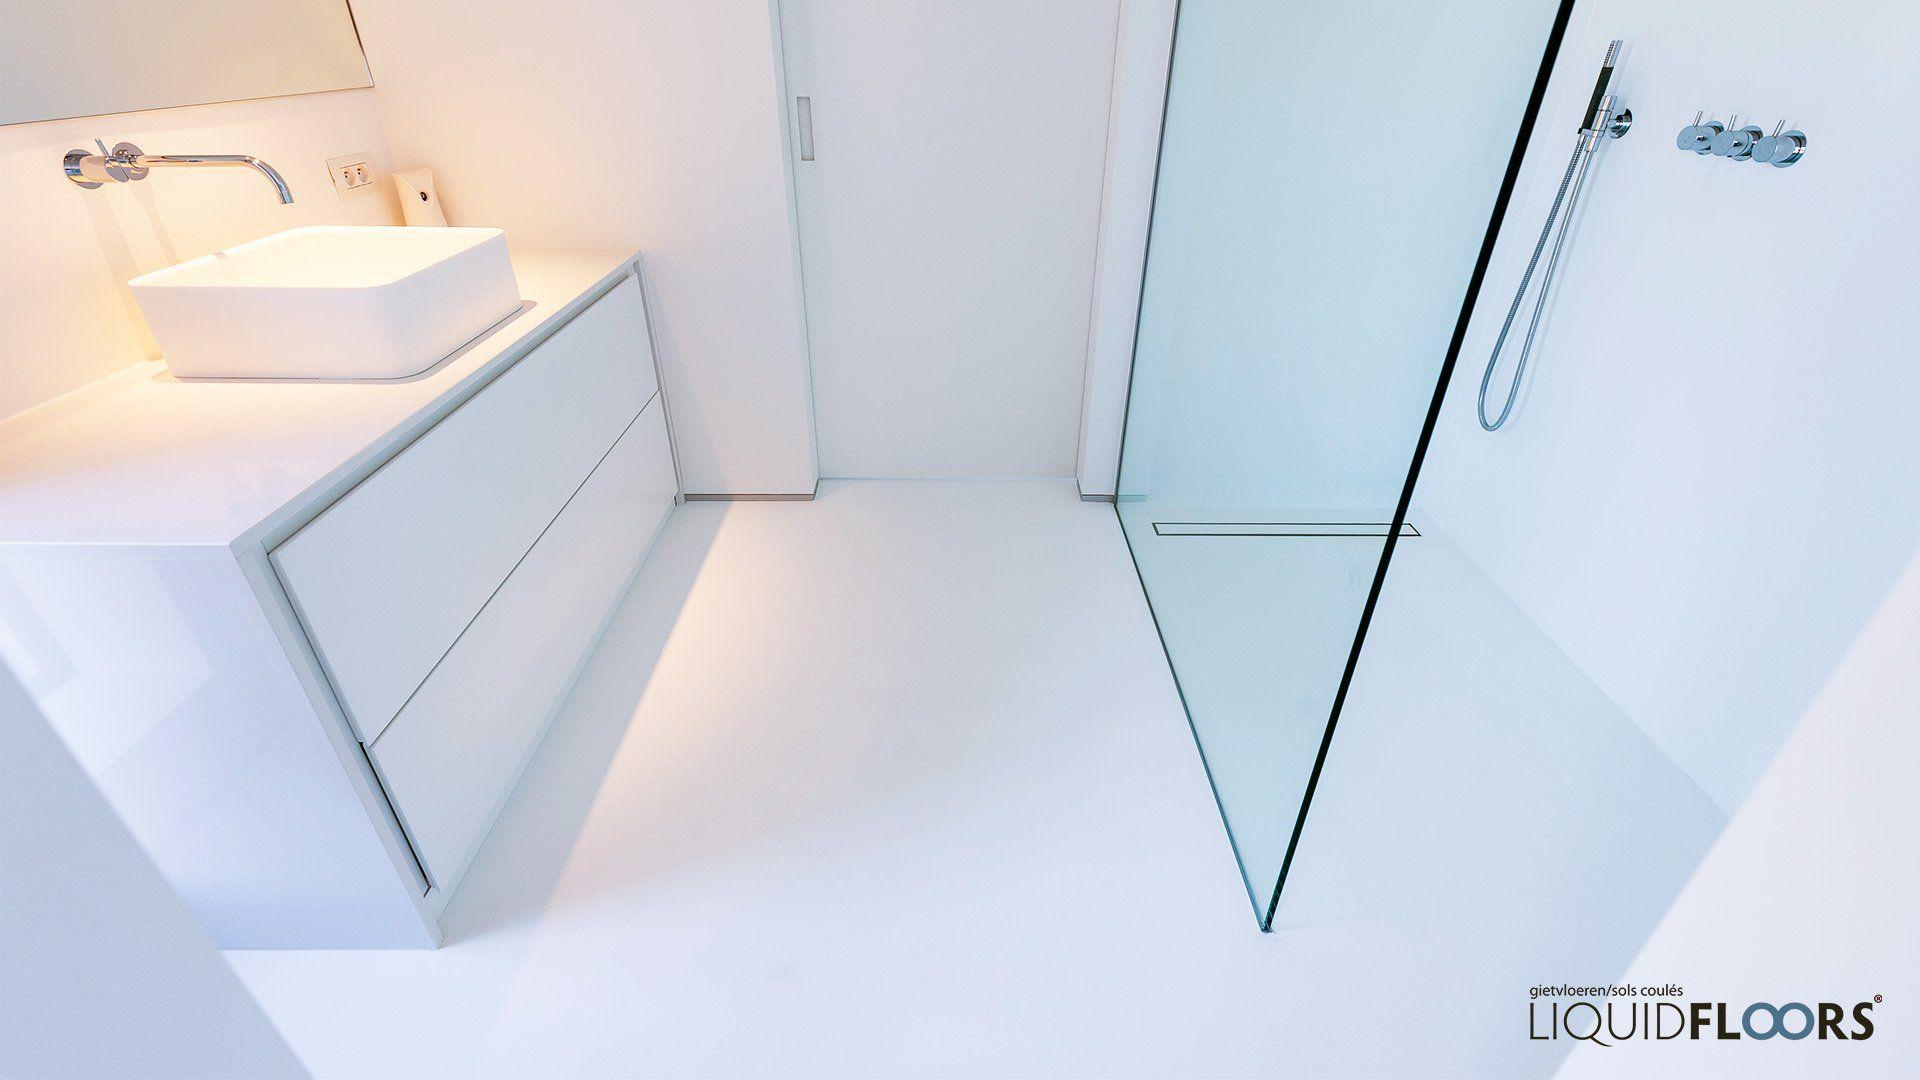 Gietvloer Badkamer Douche : Badkamer douche gietvloer liquidfloors home bathroom